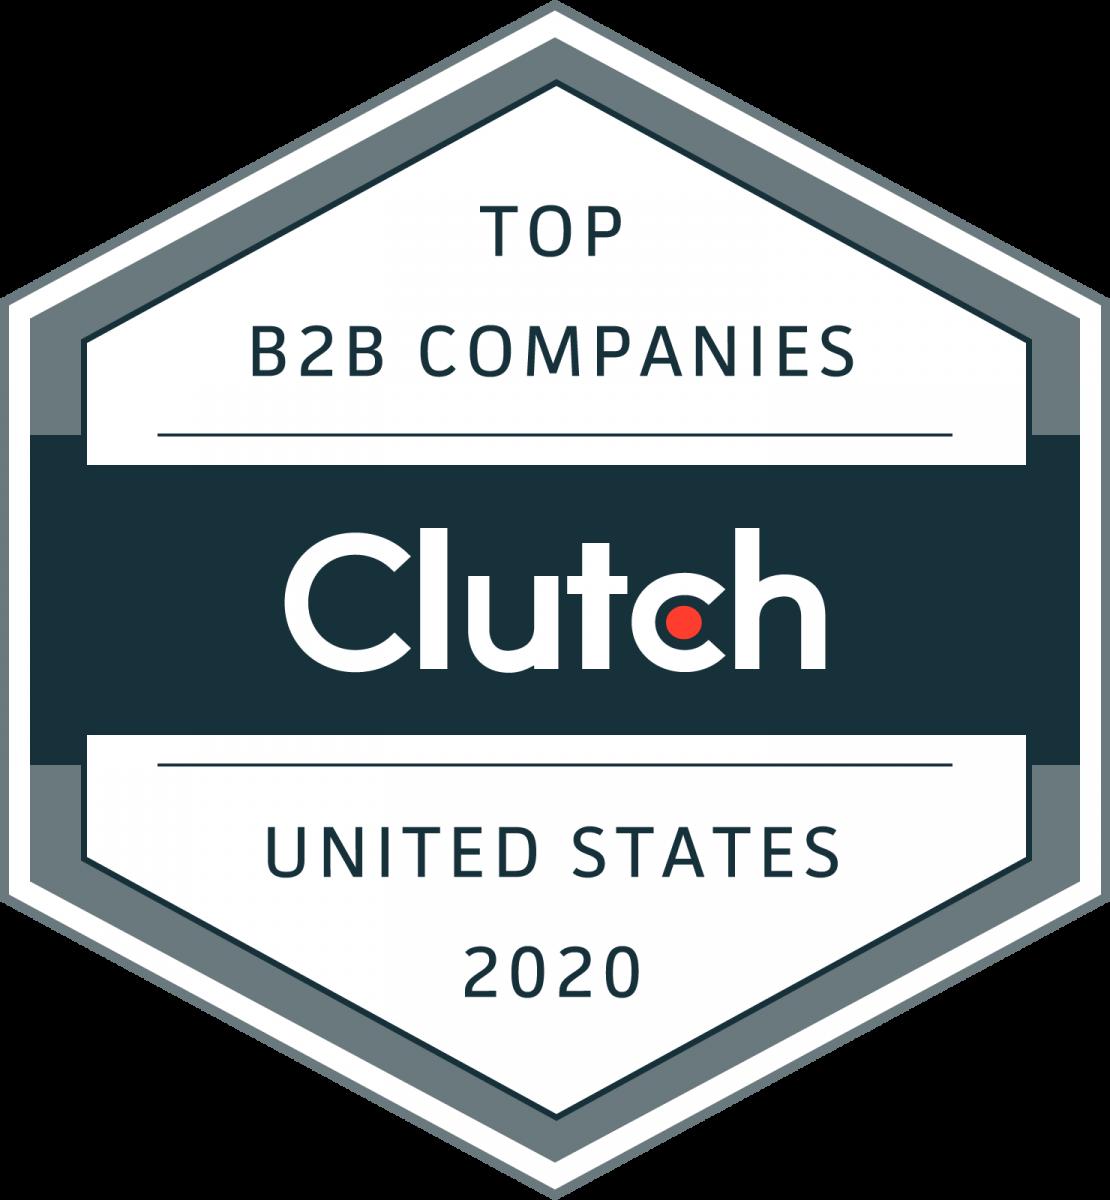 Top B2B Companies United States